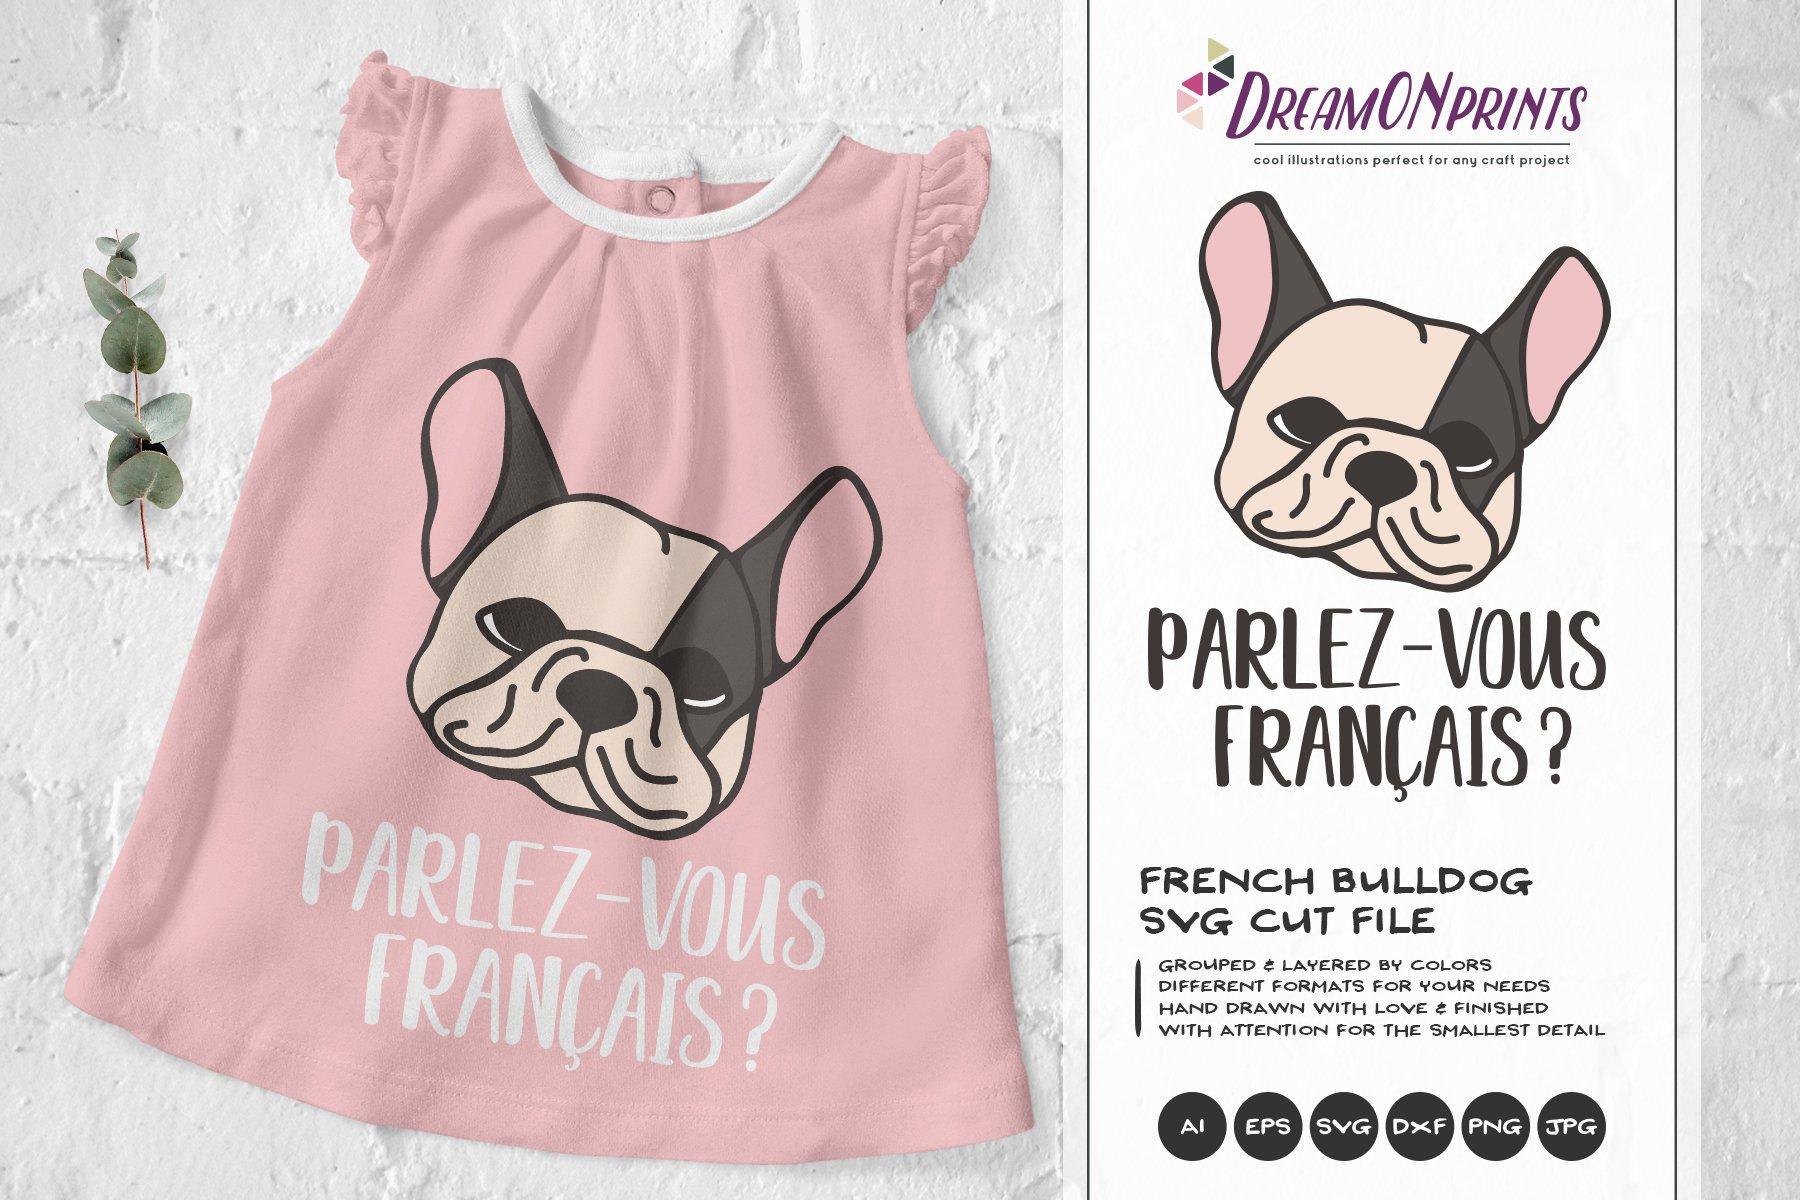 French Bulldog Svg Illustration Pre Designed Photoshop Graphics Creative Market